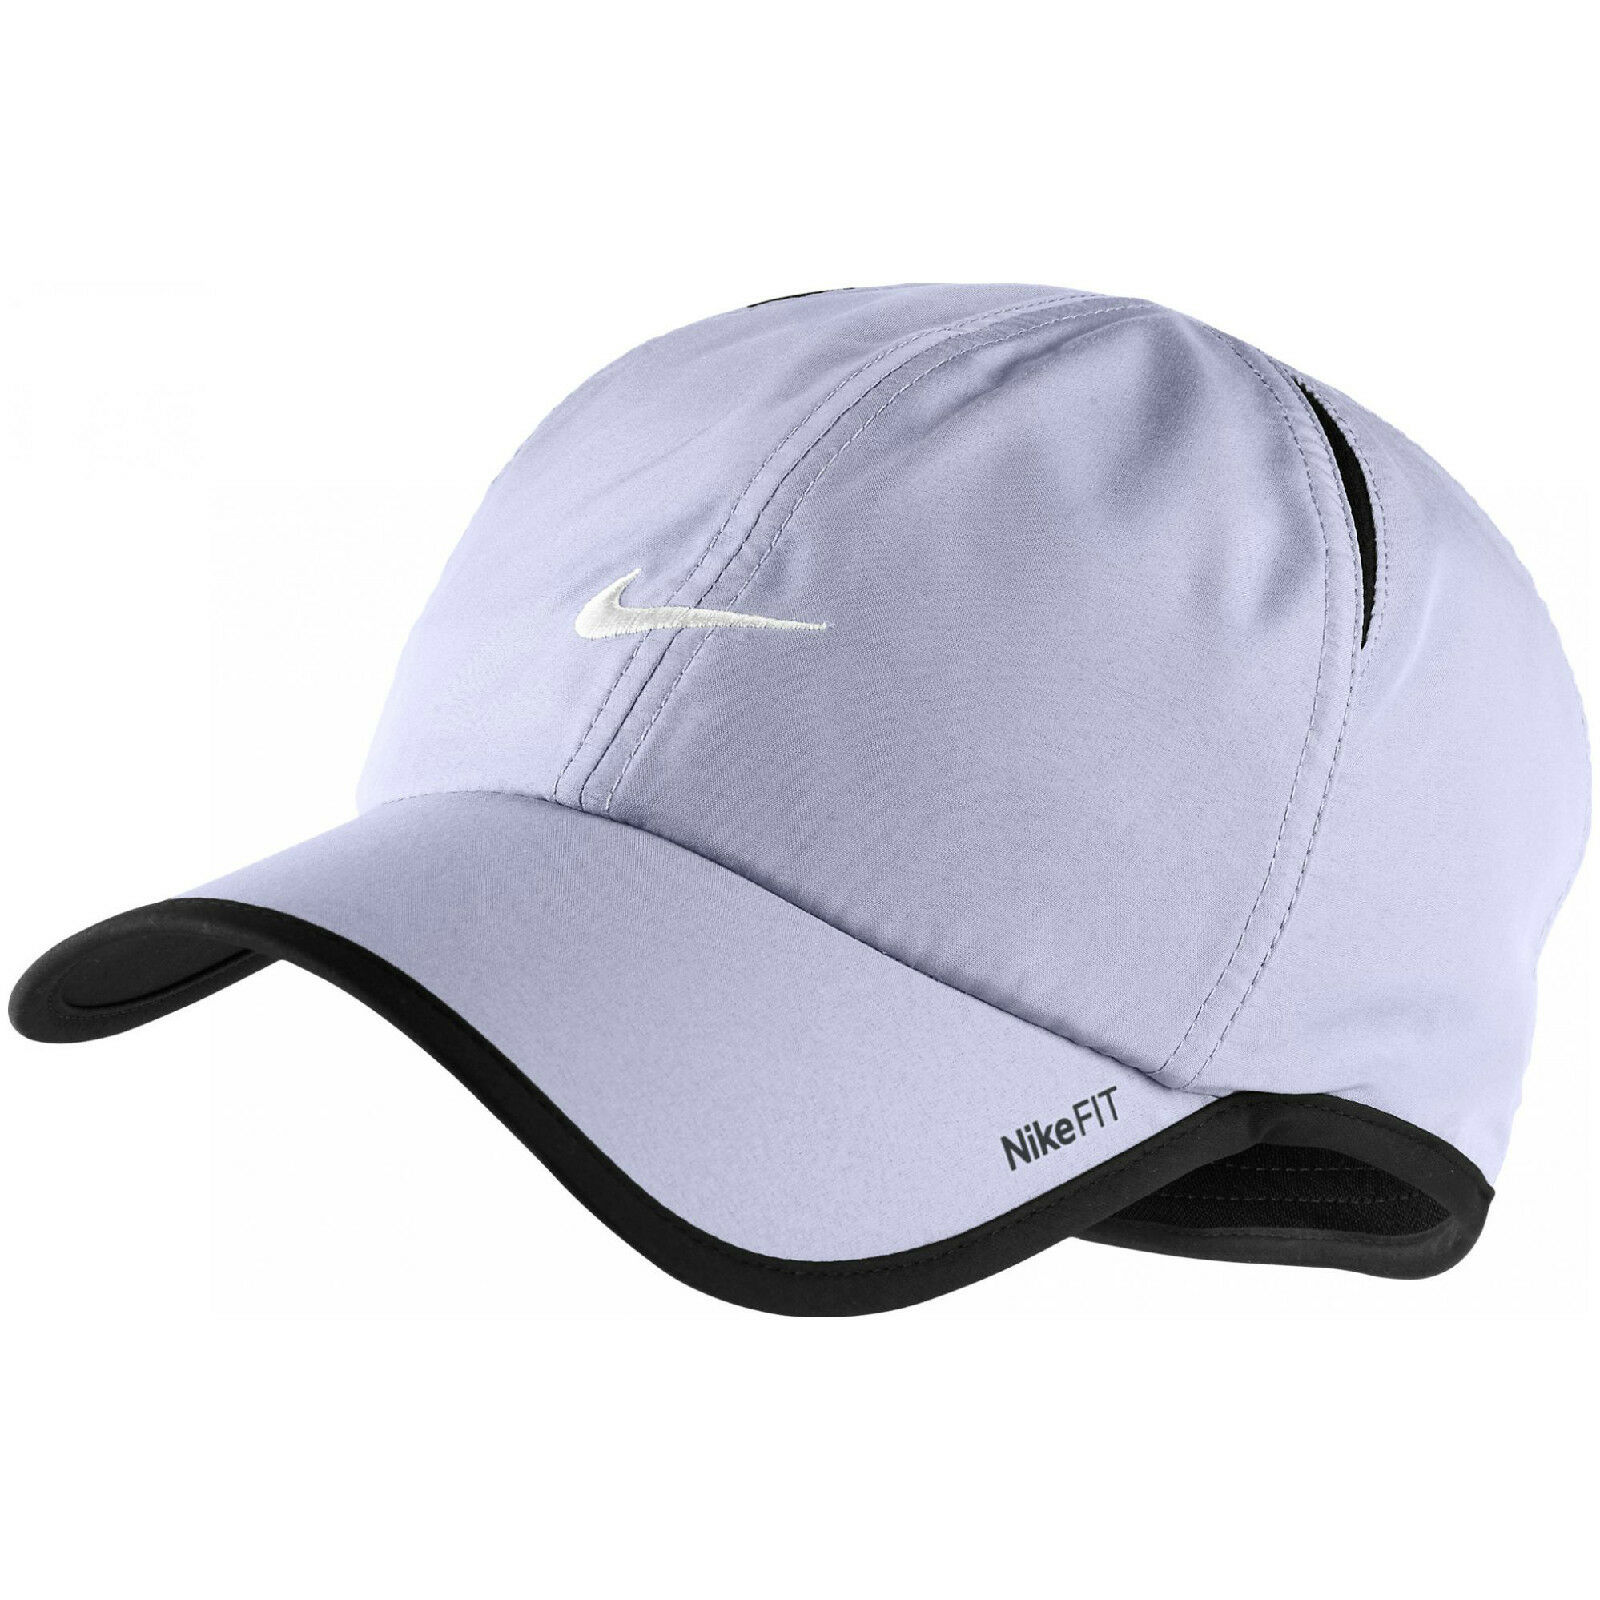 New Nike Feather Light Cap Cap Cap Hat Dri Fit Running Tennis Football 595510-531 Violet fd6c15